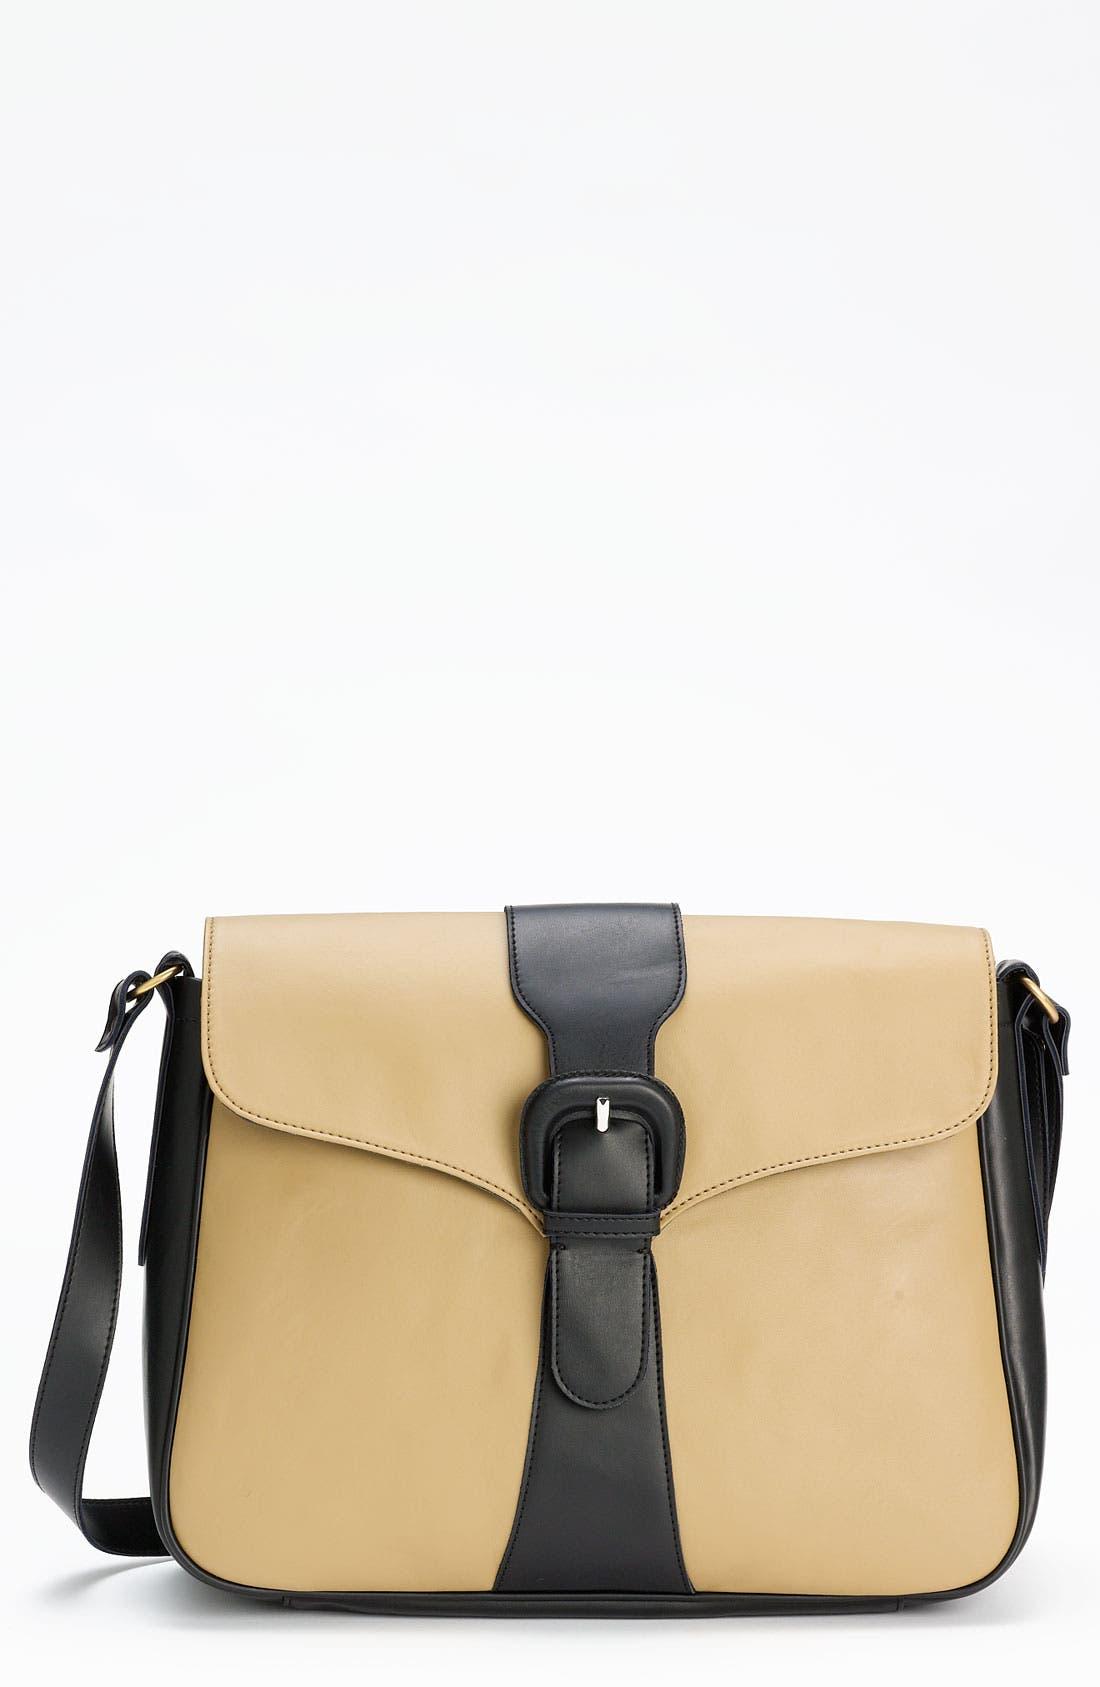 Main Image - Marni 'Medium' Shoulder Bag